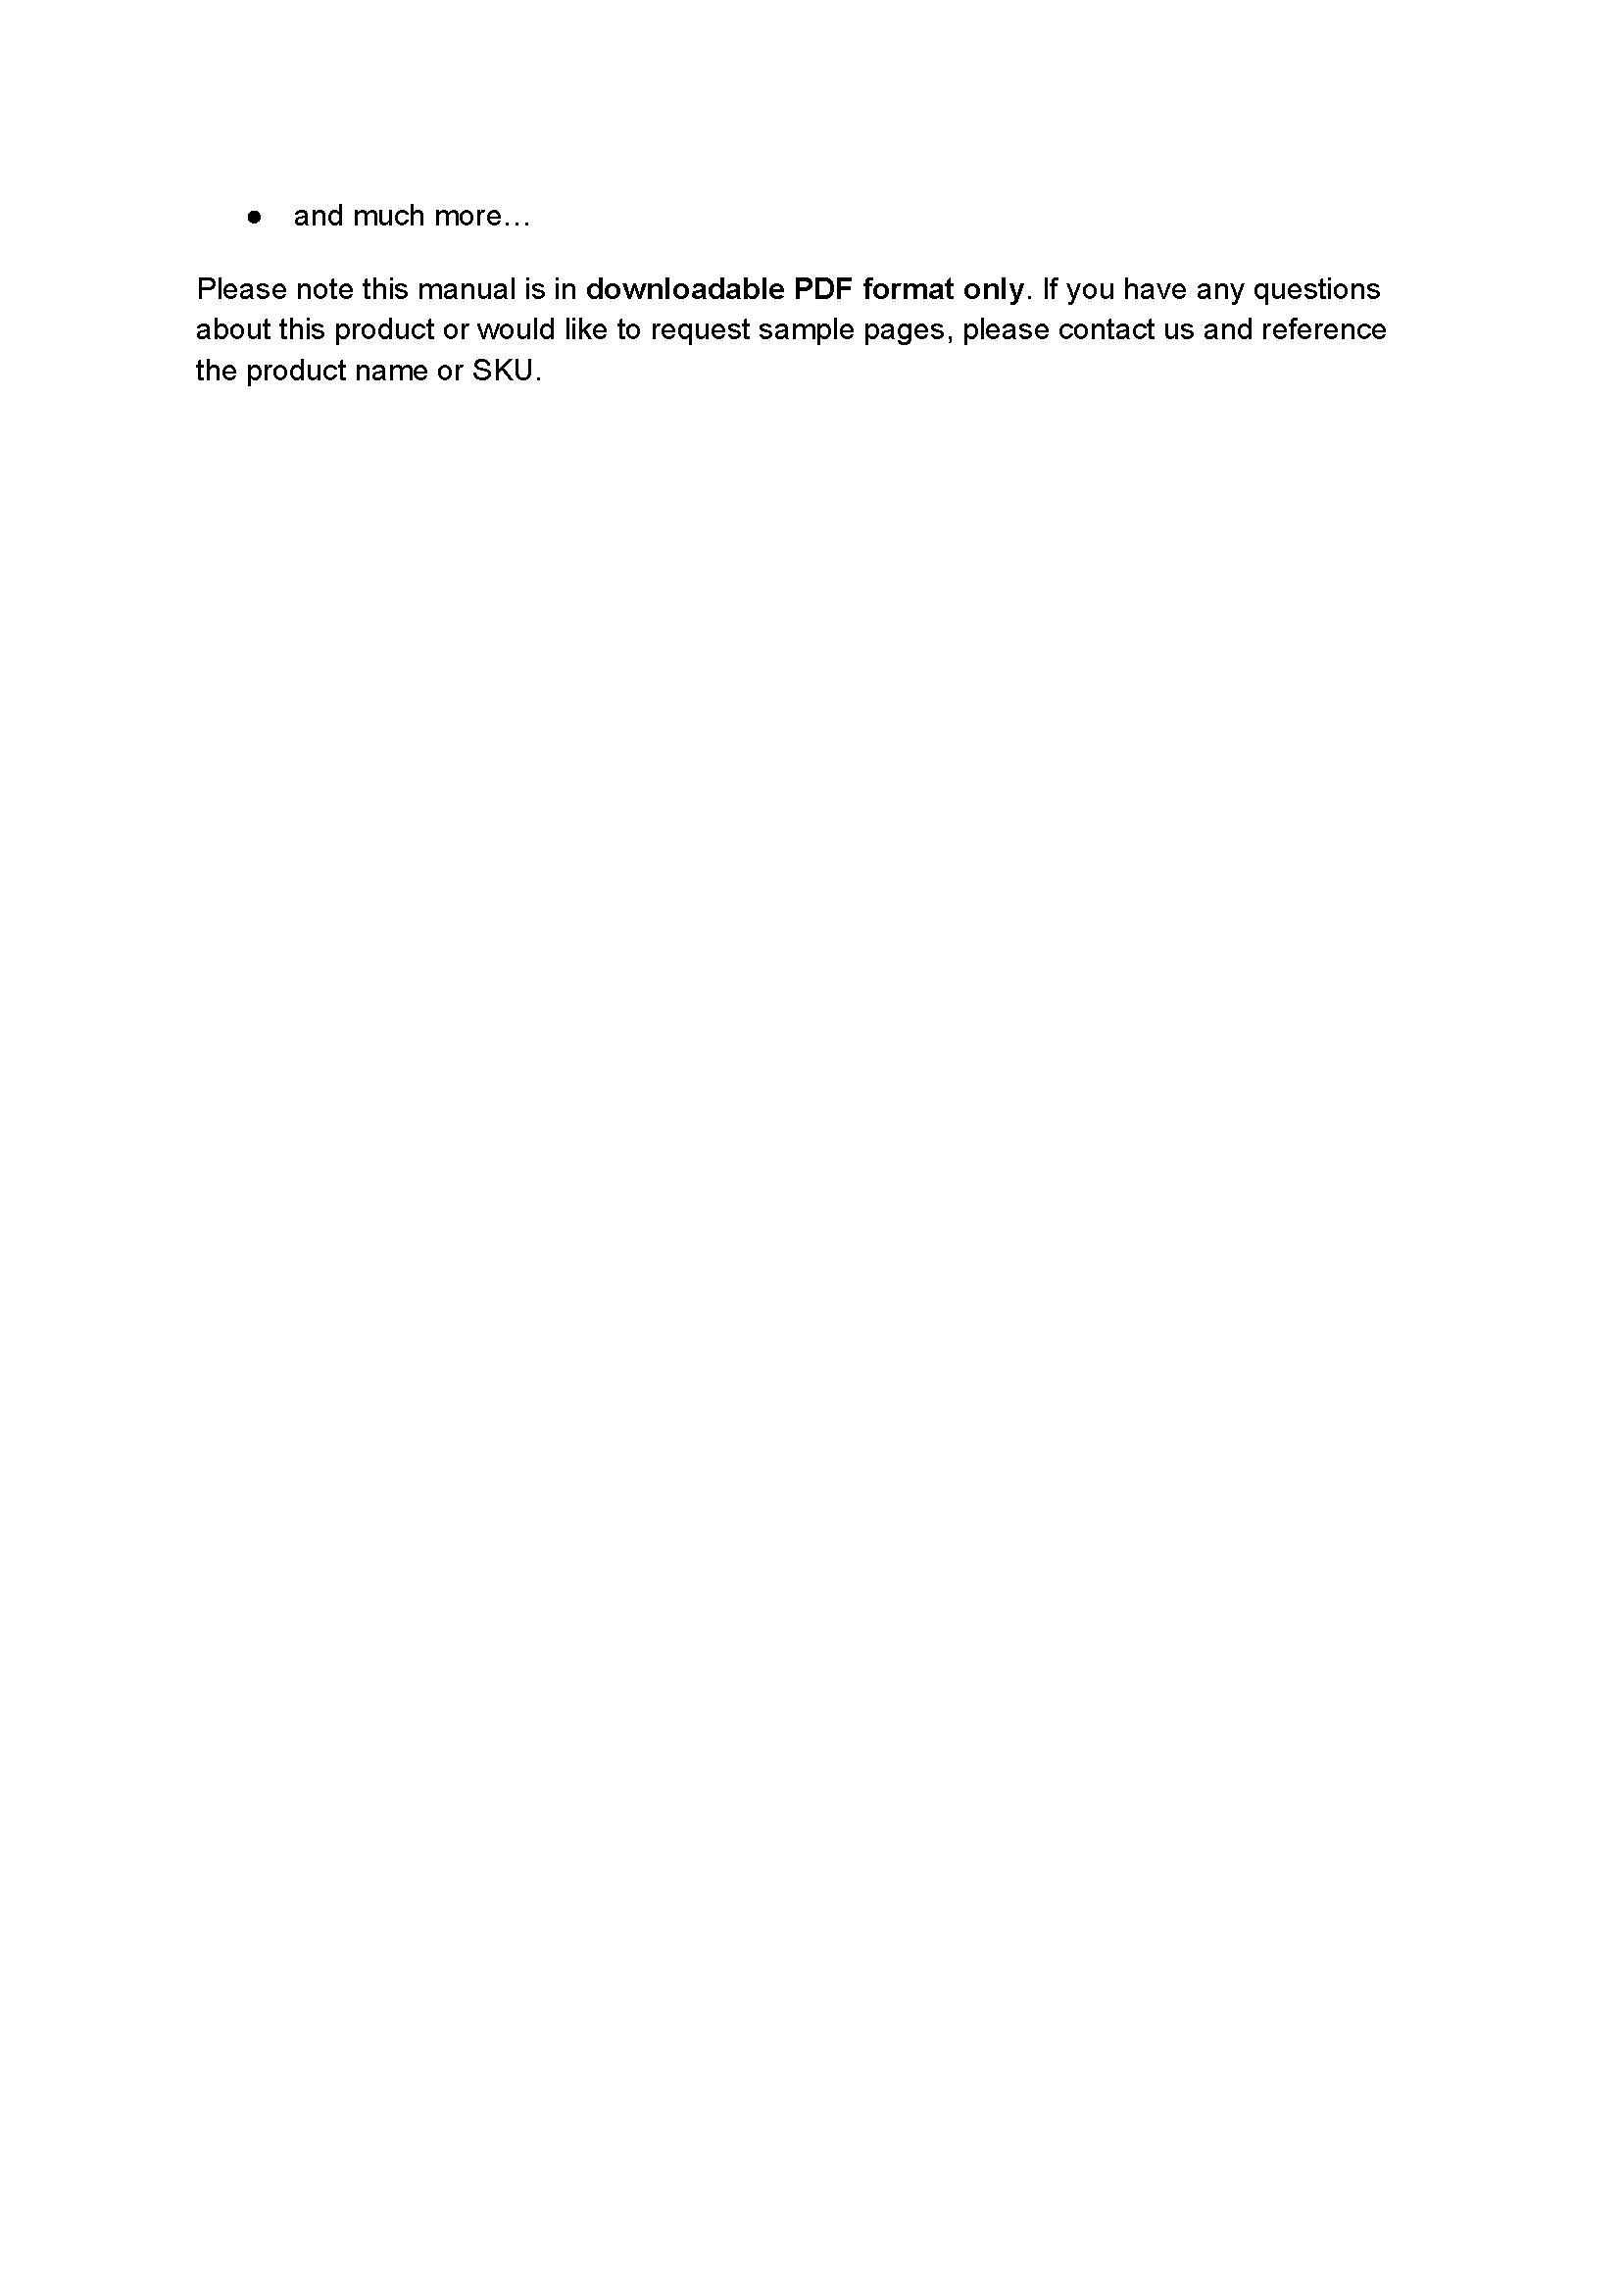 John Deere 6300 manual